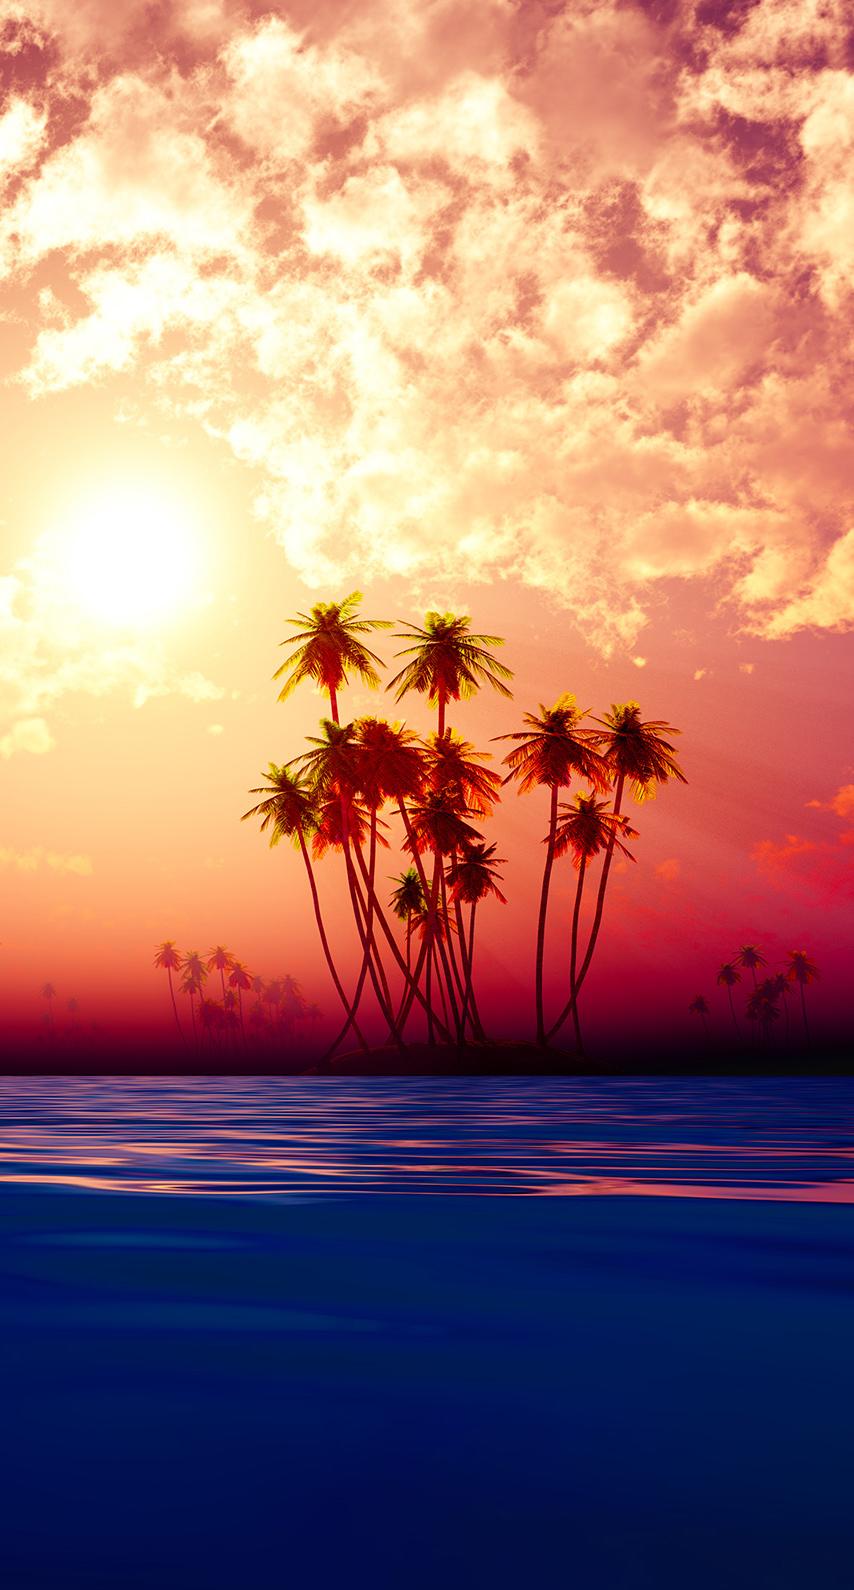 no person, dawn, fair weather, dusk, seascape, seashore